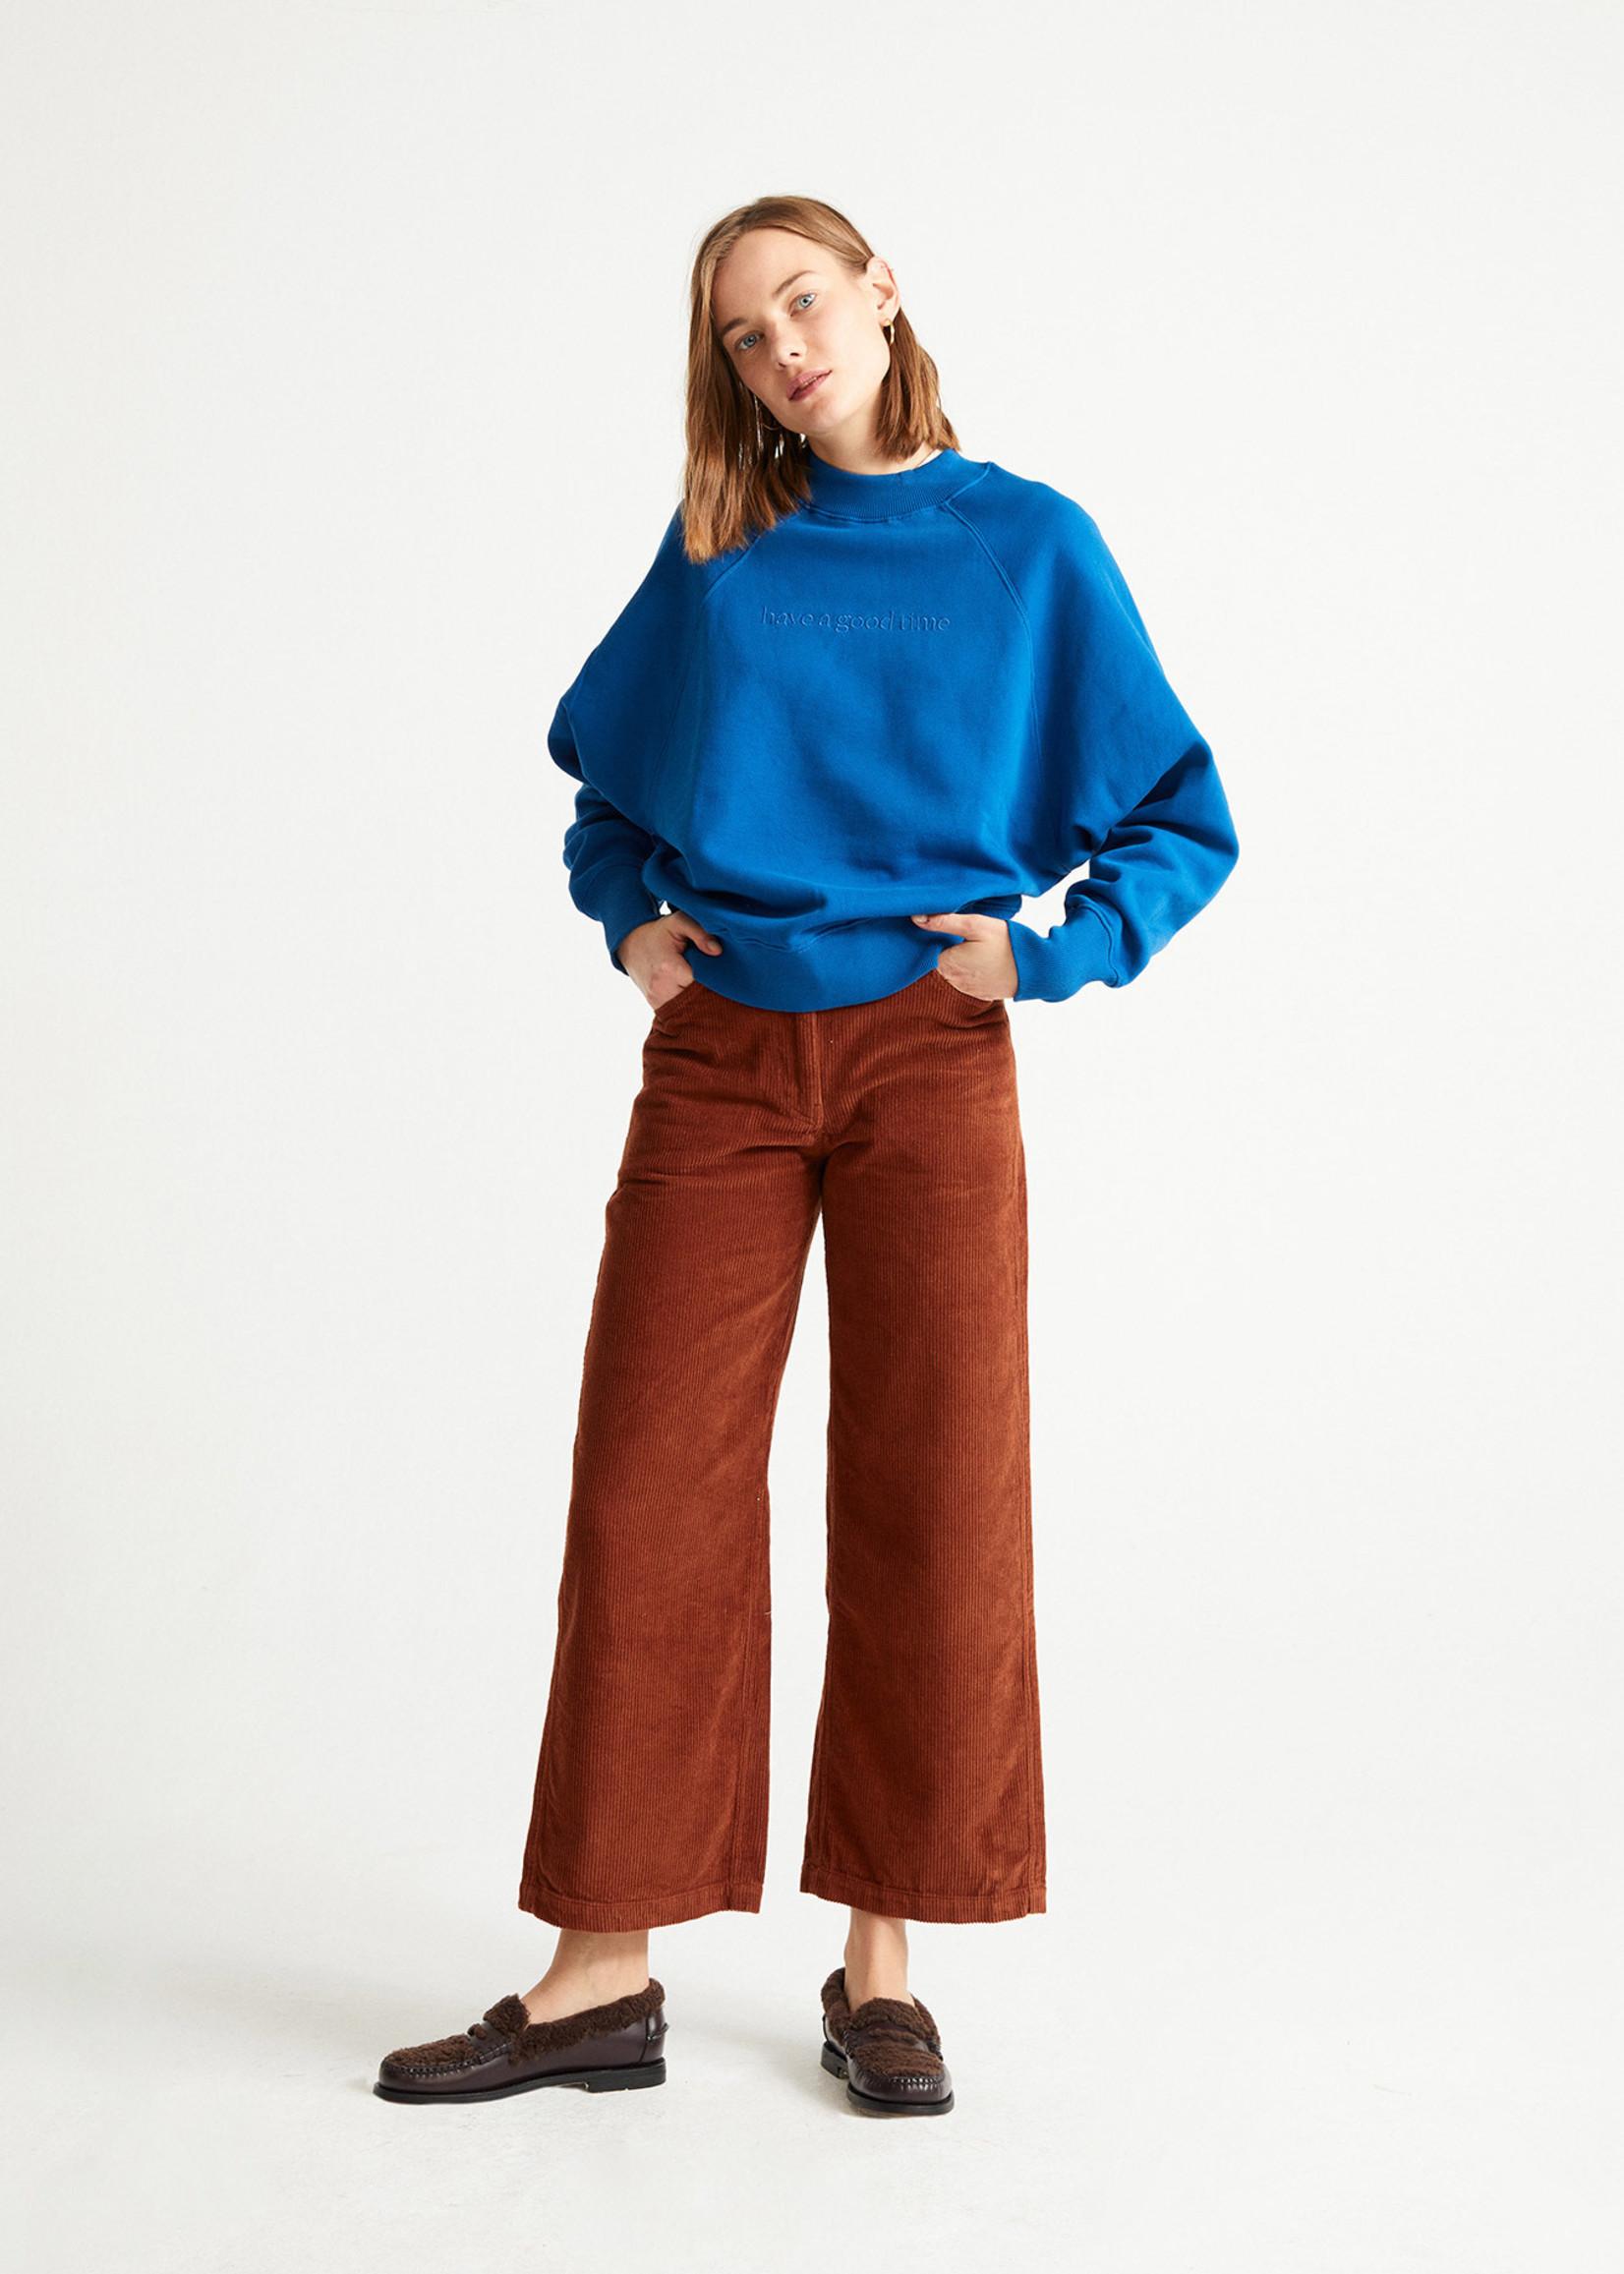 Thinking Mu Good Time Blue Sweatshirt